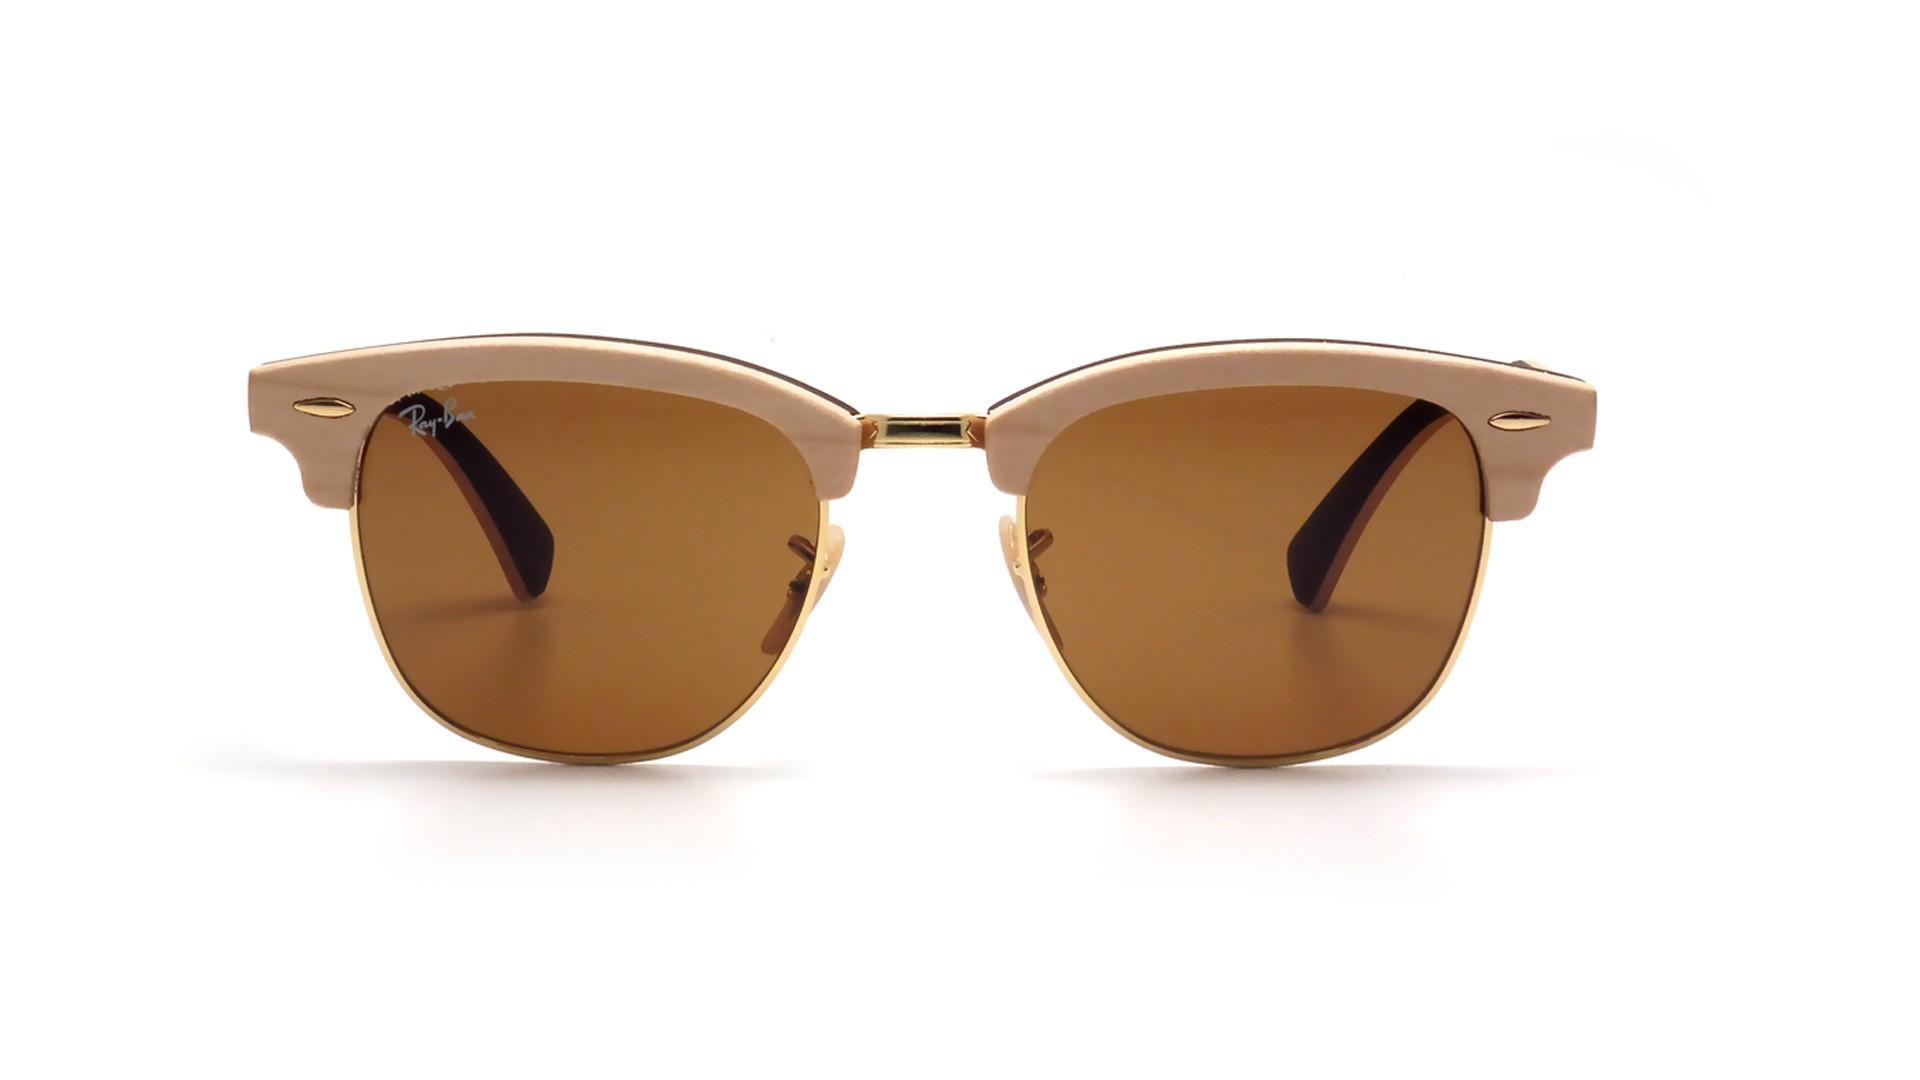 5f64578de8a Knock Off Ray Bans Clubmaster Oversized Sunglasses « Heritage Malta